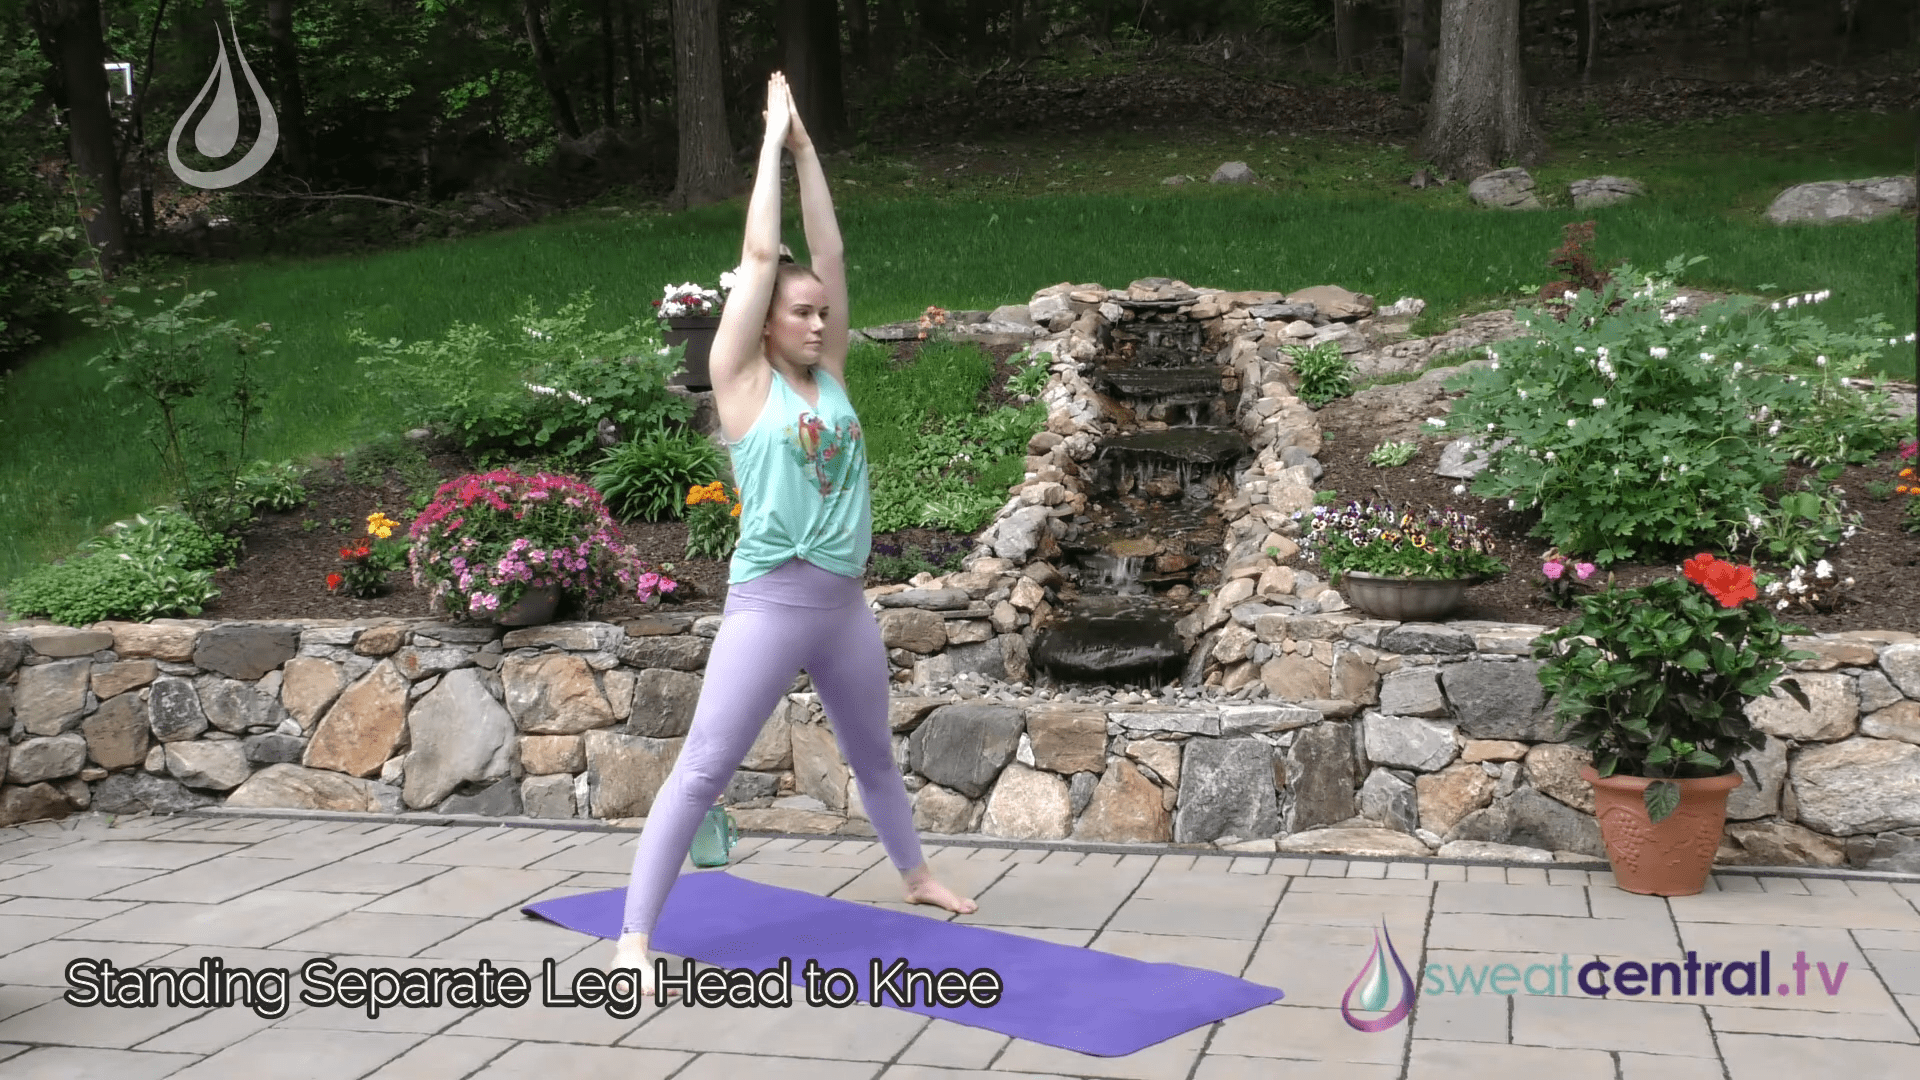 Bikram Yoga Class 30 Minutes. All 26 Bikram Yoga Postures 12 57 screenshot